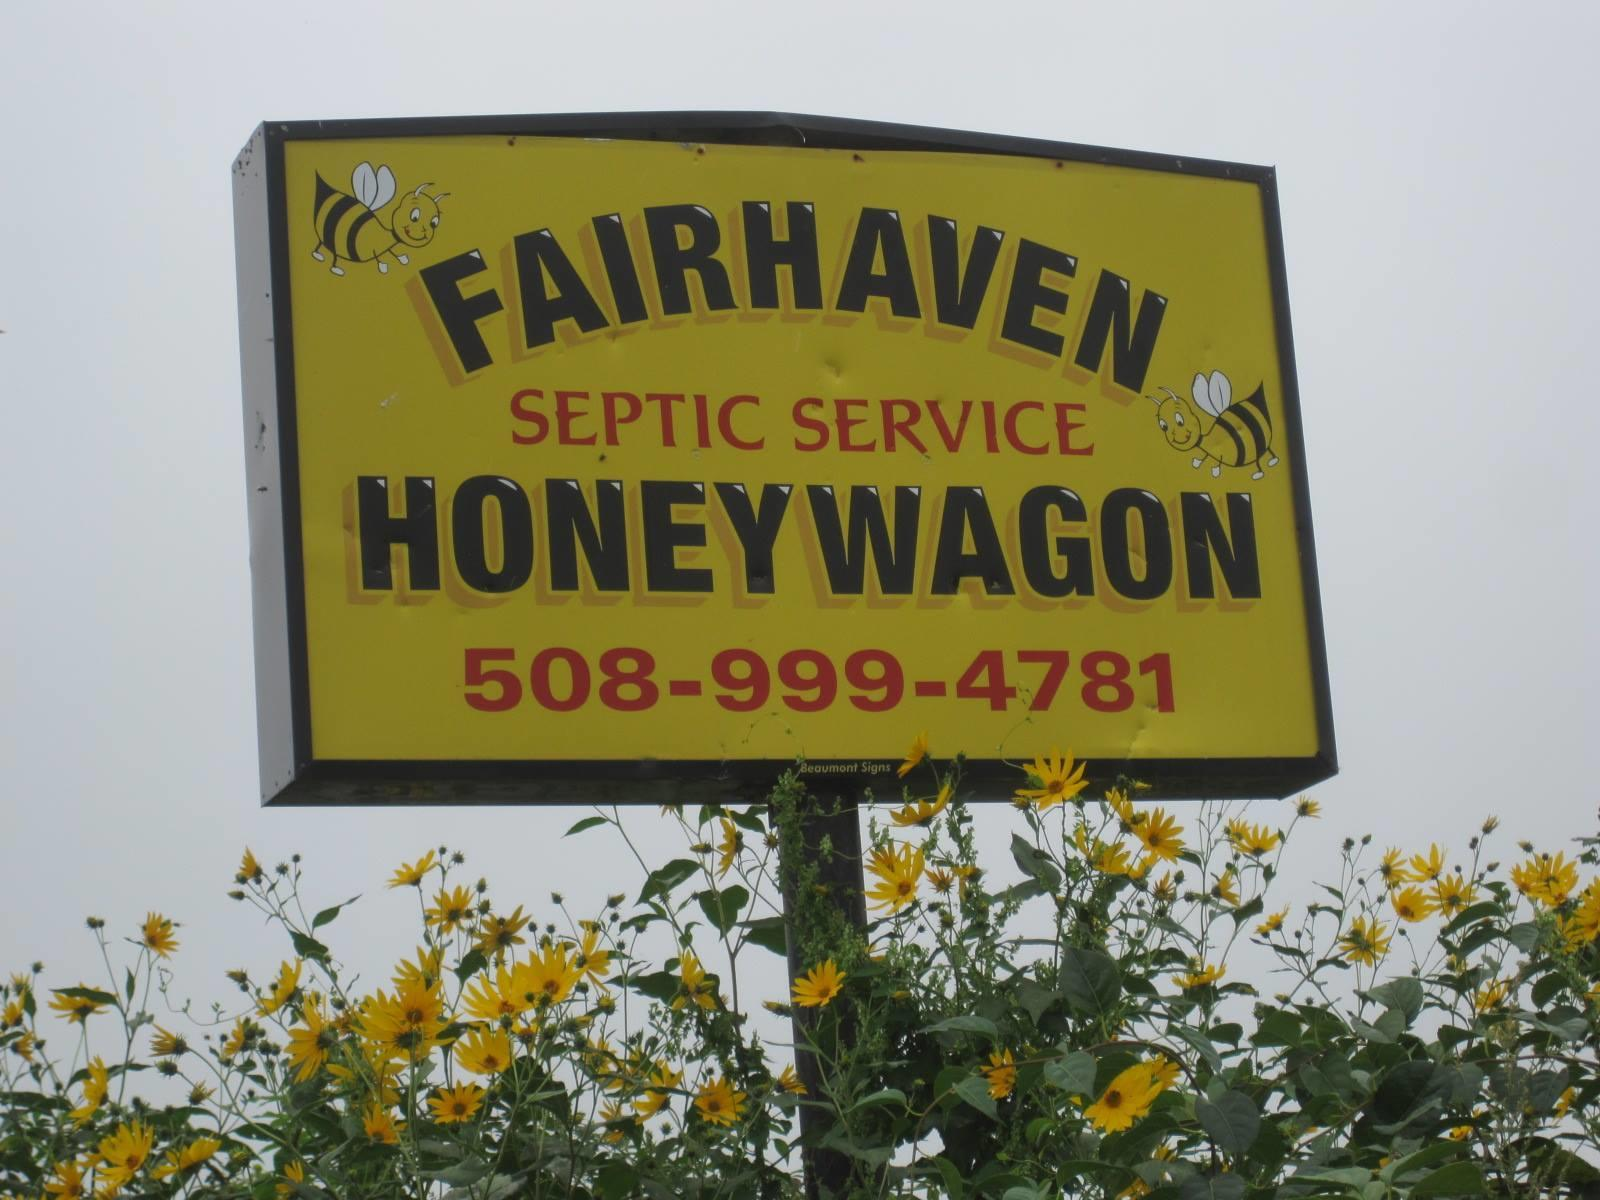 Fairhaven Honeywagon image 0